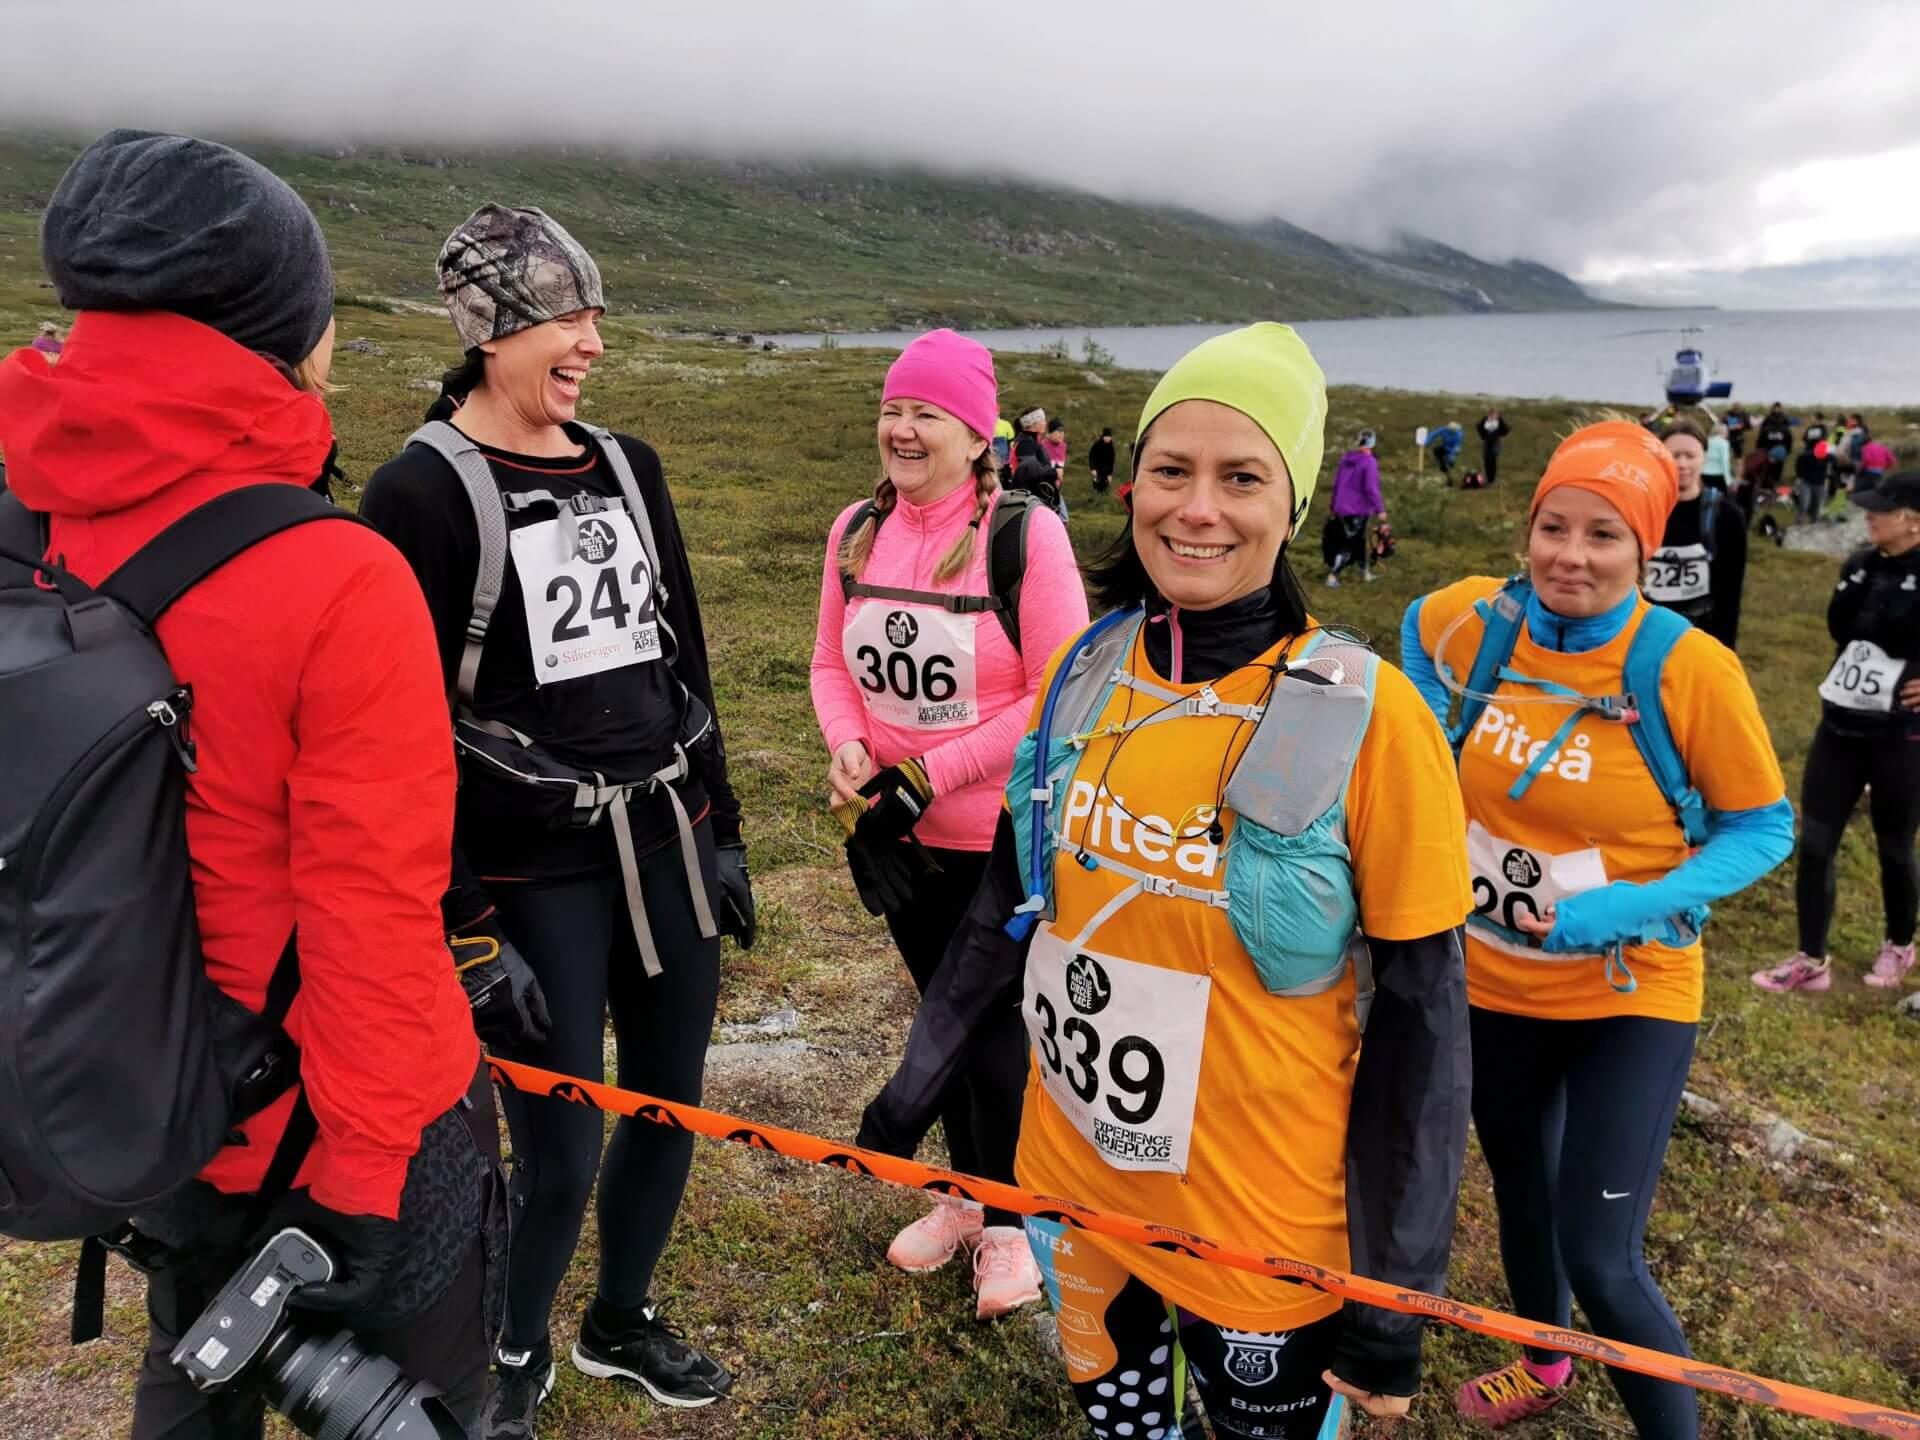 Arctic Circle Race 2019 Polcirkelloppet Guijaure start 339 Elin